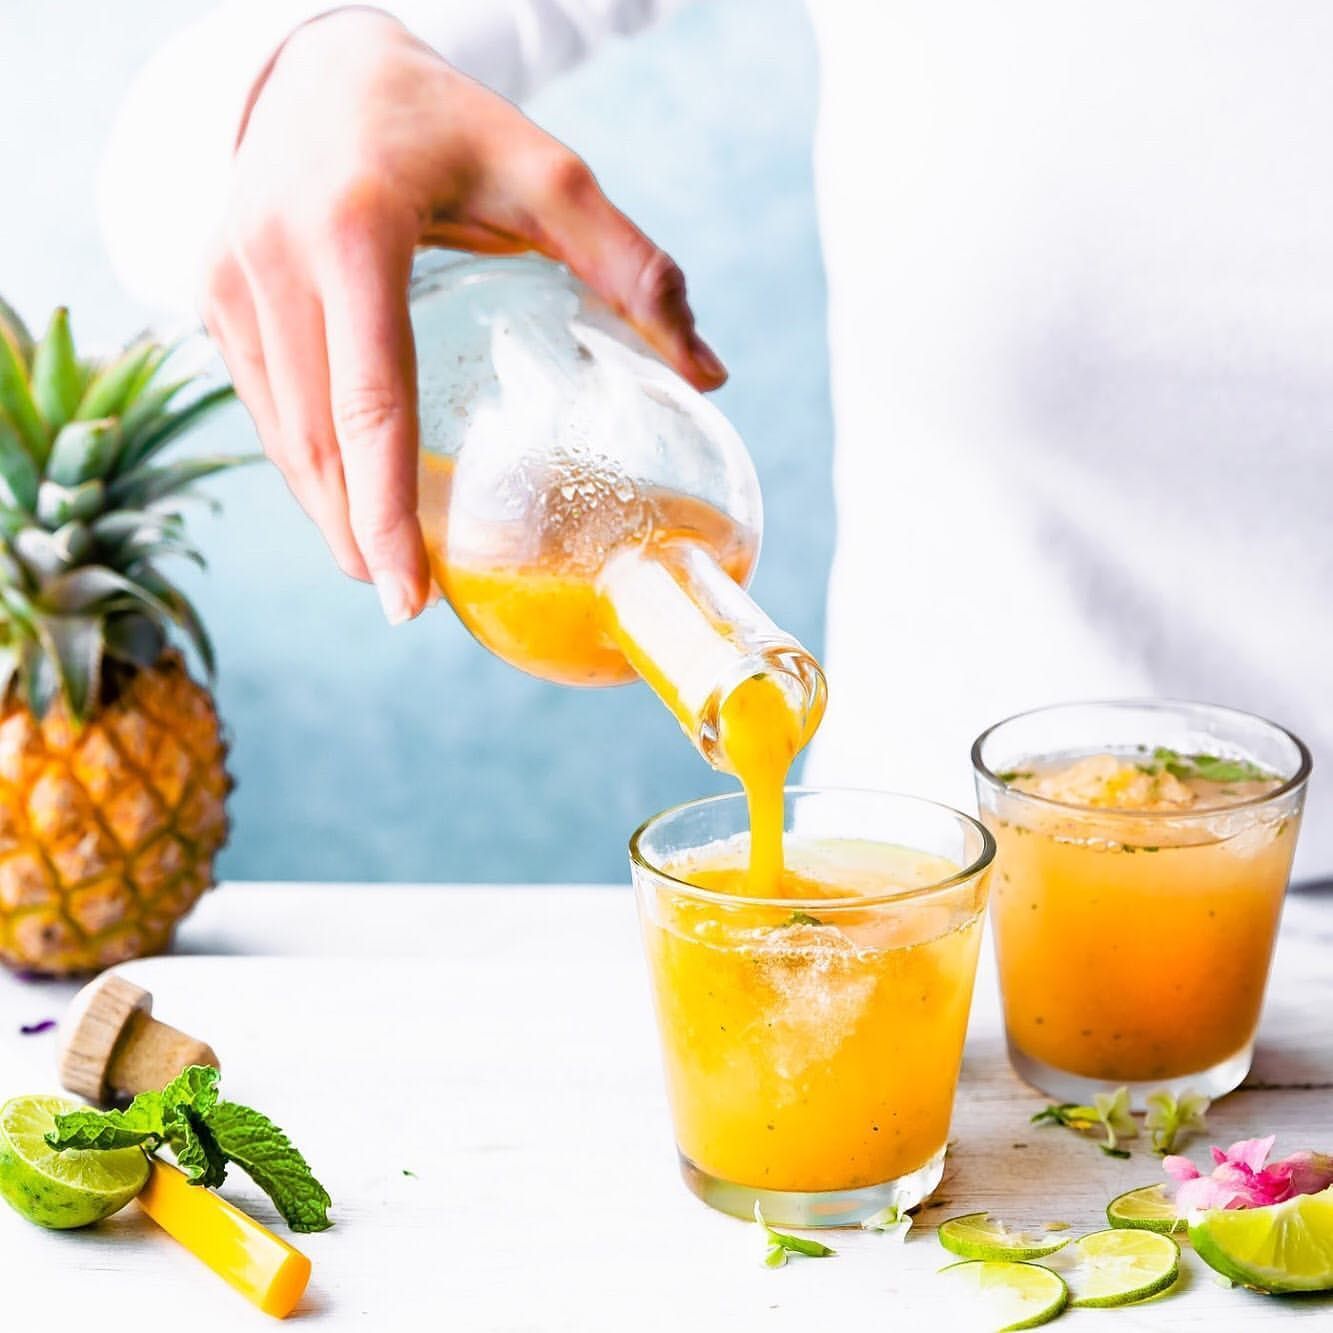 Turmeric Pineapple Shrub